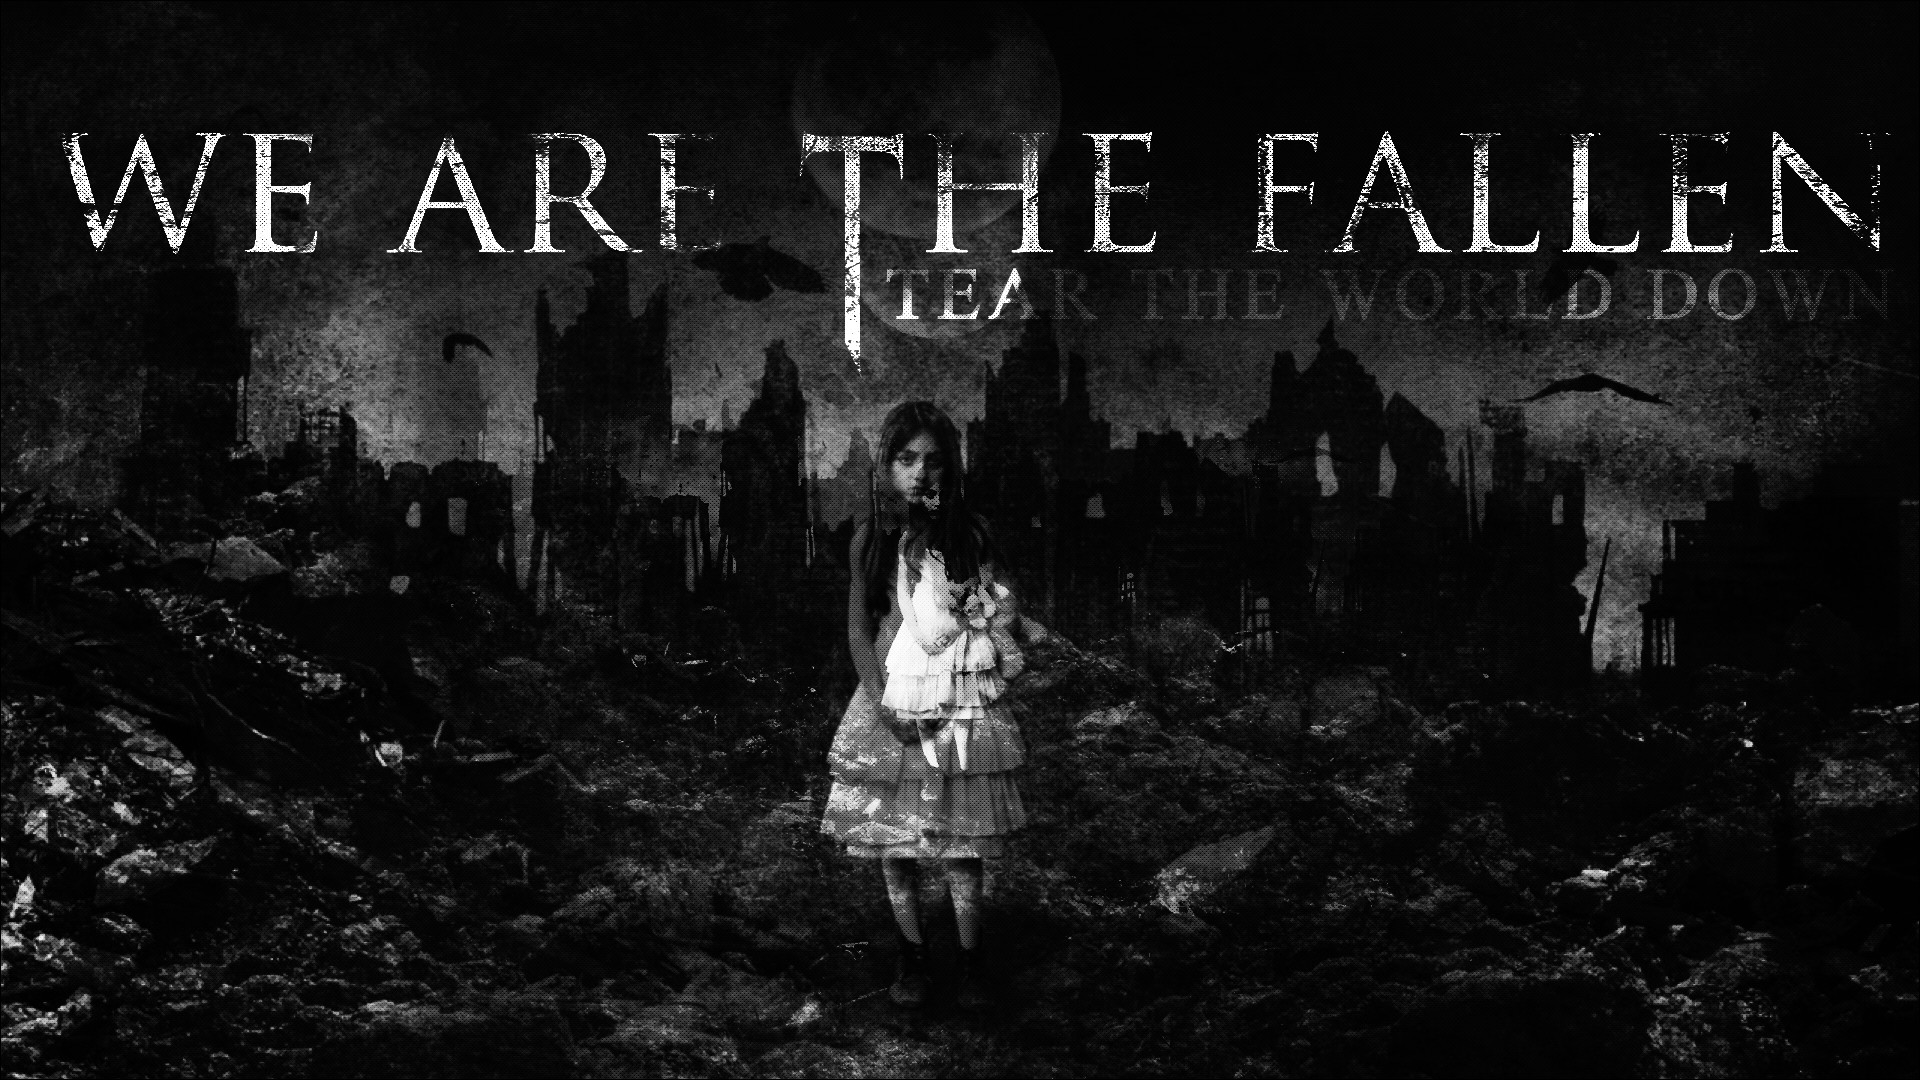 … WATF : Tear The World Down Full-HD Wallpaper 2 by disturbedkorea